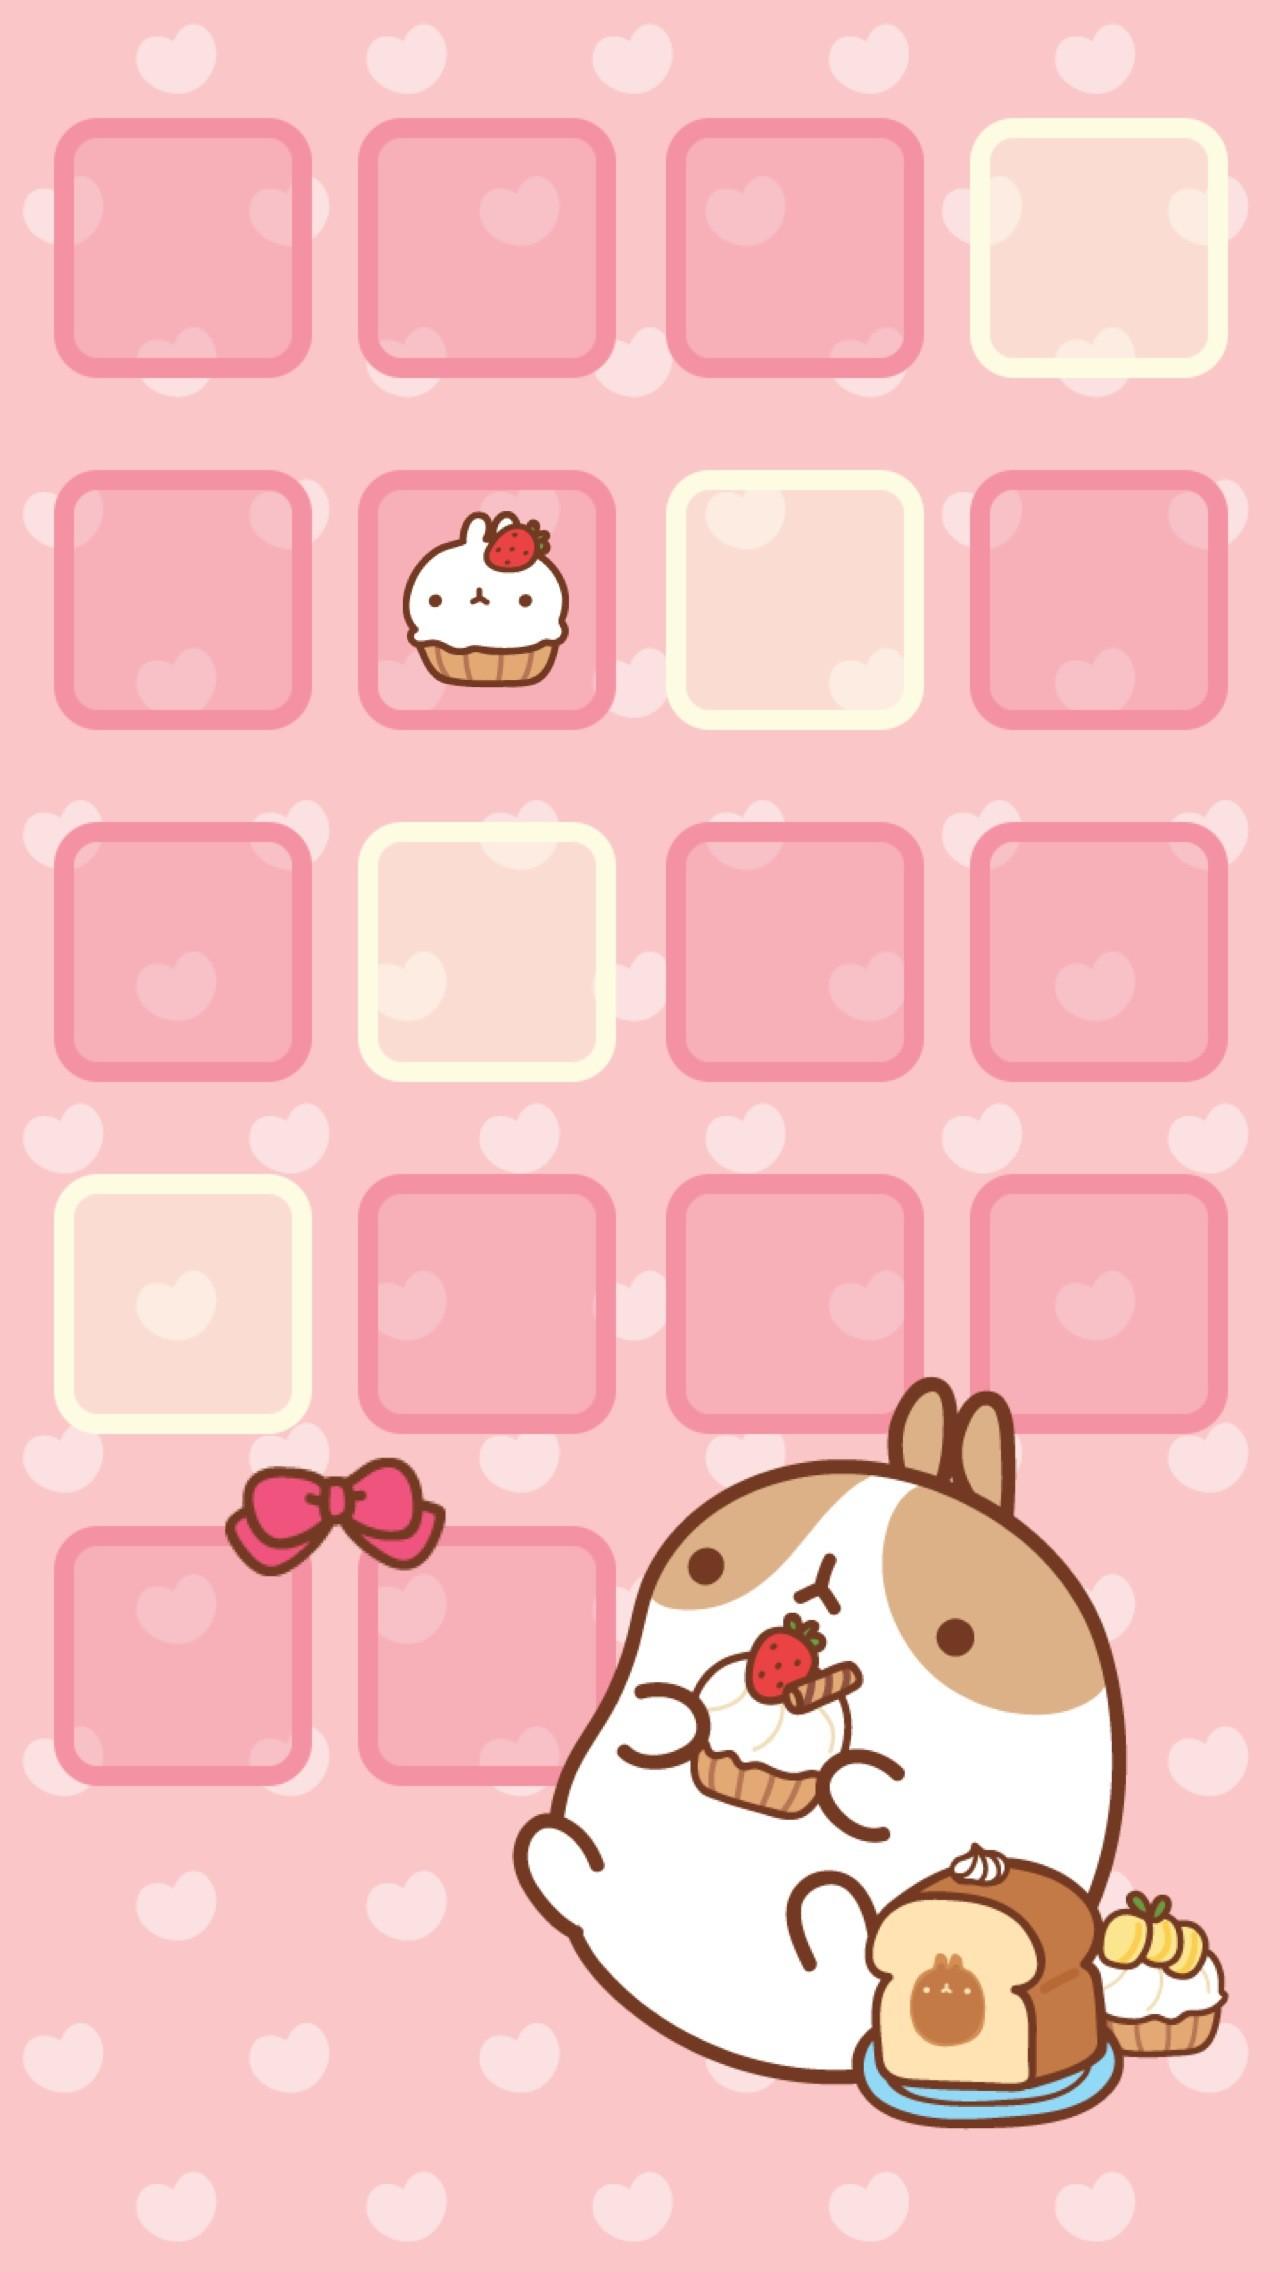 Смотреть cute wallpapers for iphone 5s | FLI